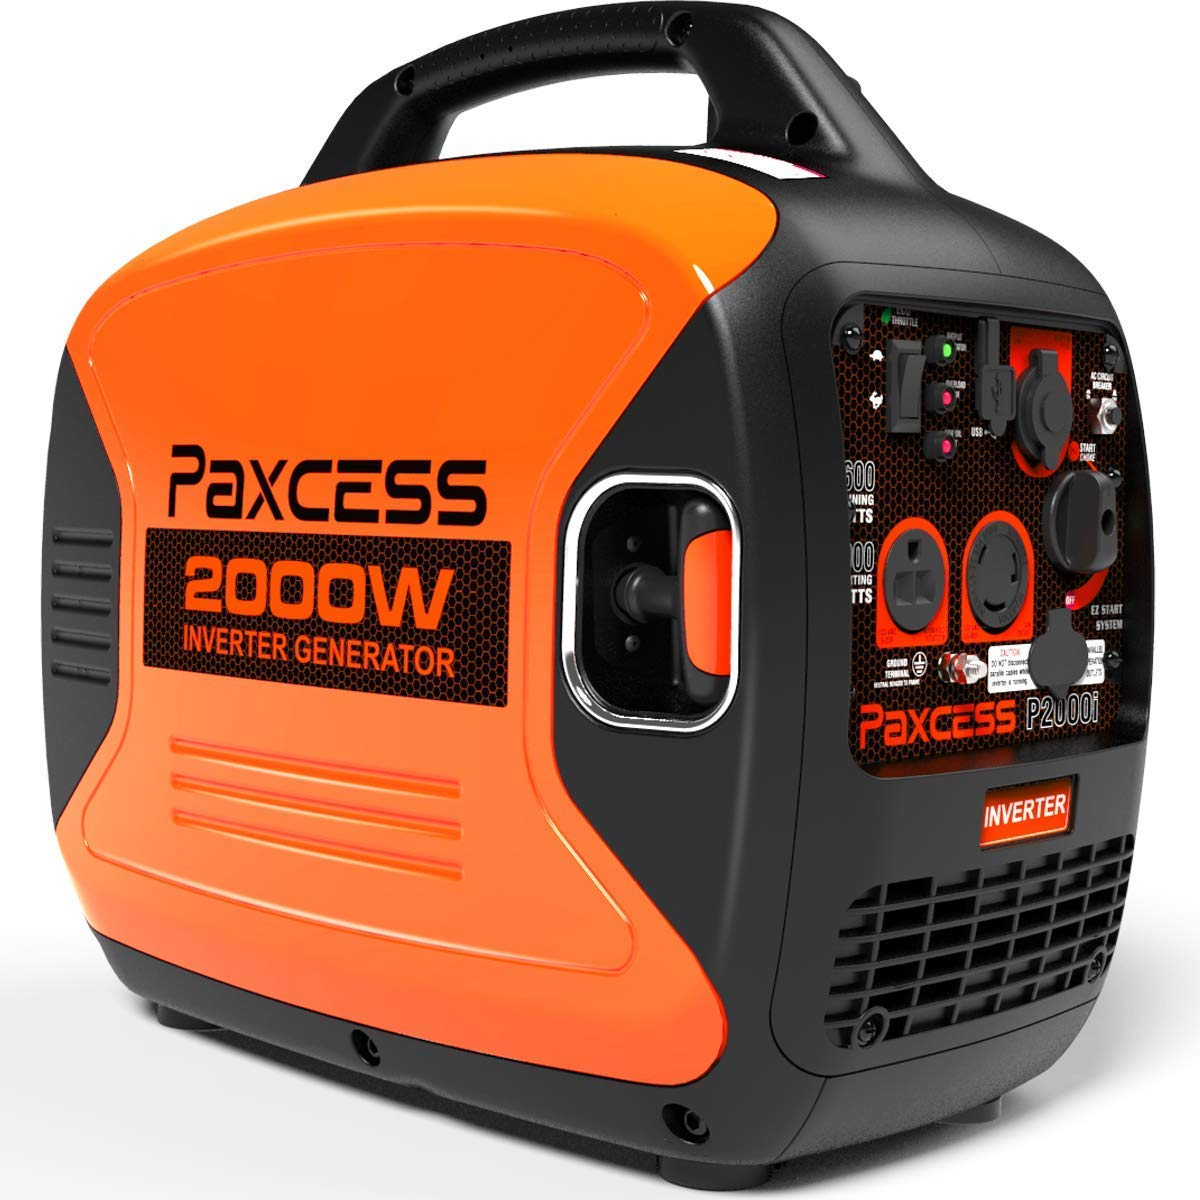 PAXCESS 2000W Portable Generator